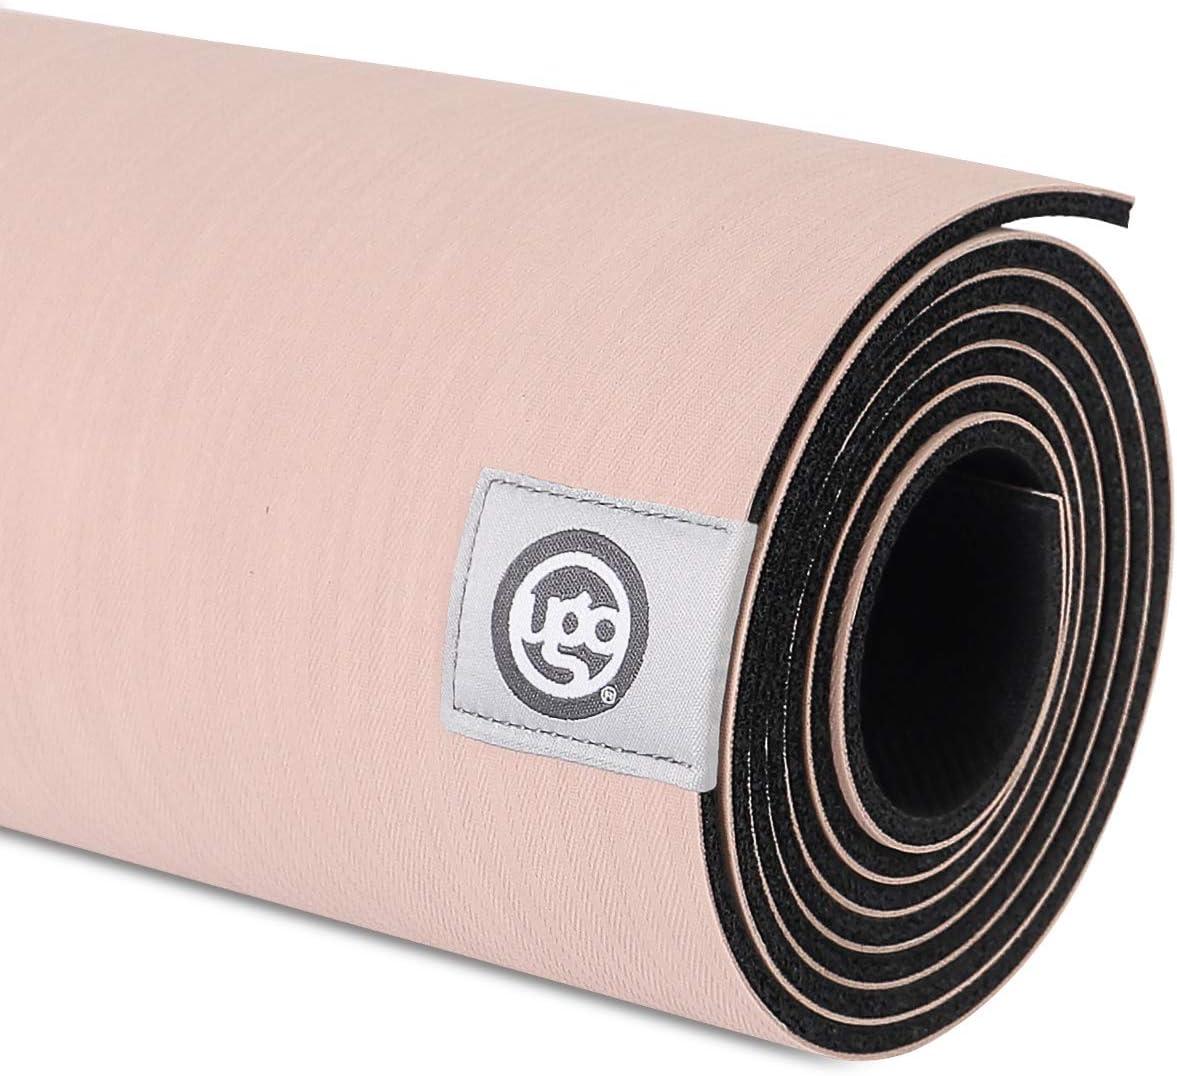 UGO Rubber Yoga Mat 71 x Reversible Extra オーバーのアイテム取扱☆ Non-Slip Inch 迅速な対応で商品をお届け致します 26 Large